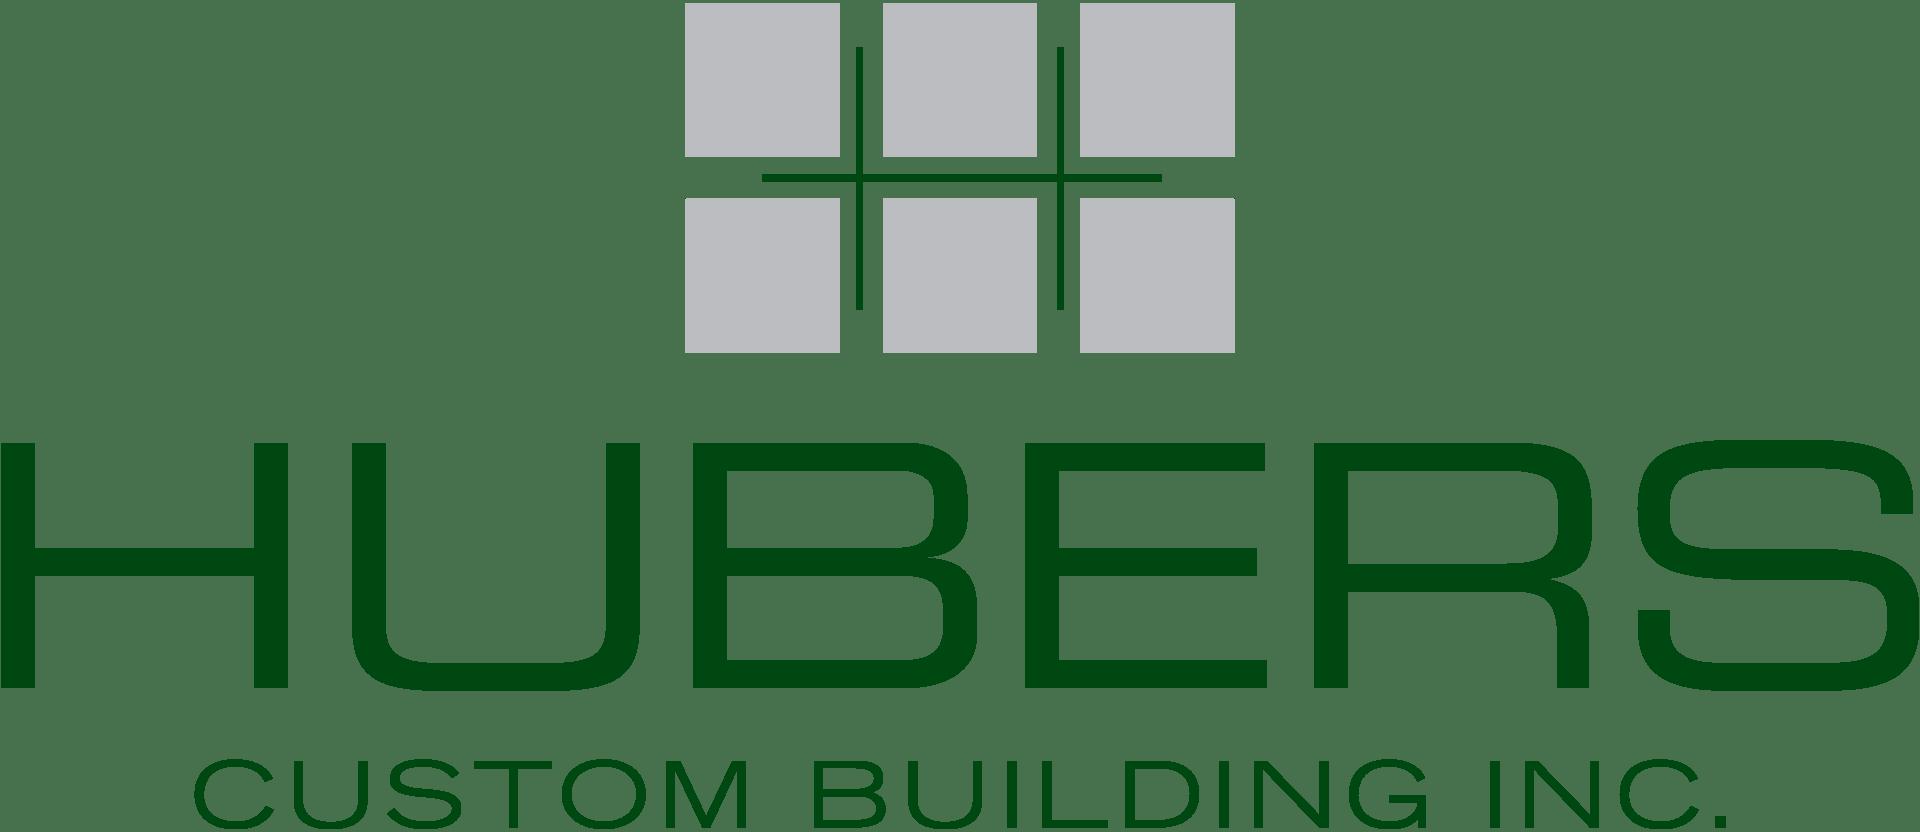 Huber's-Logo-1920x832